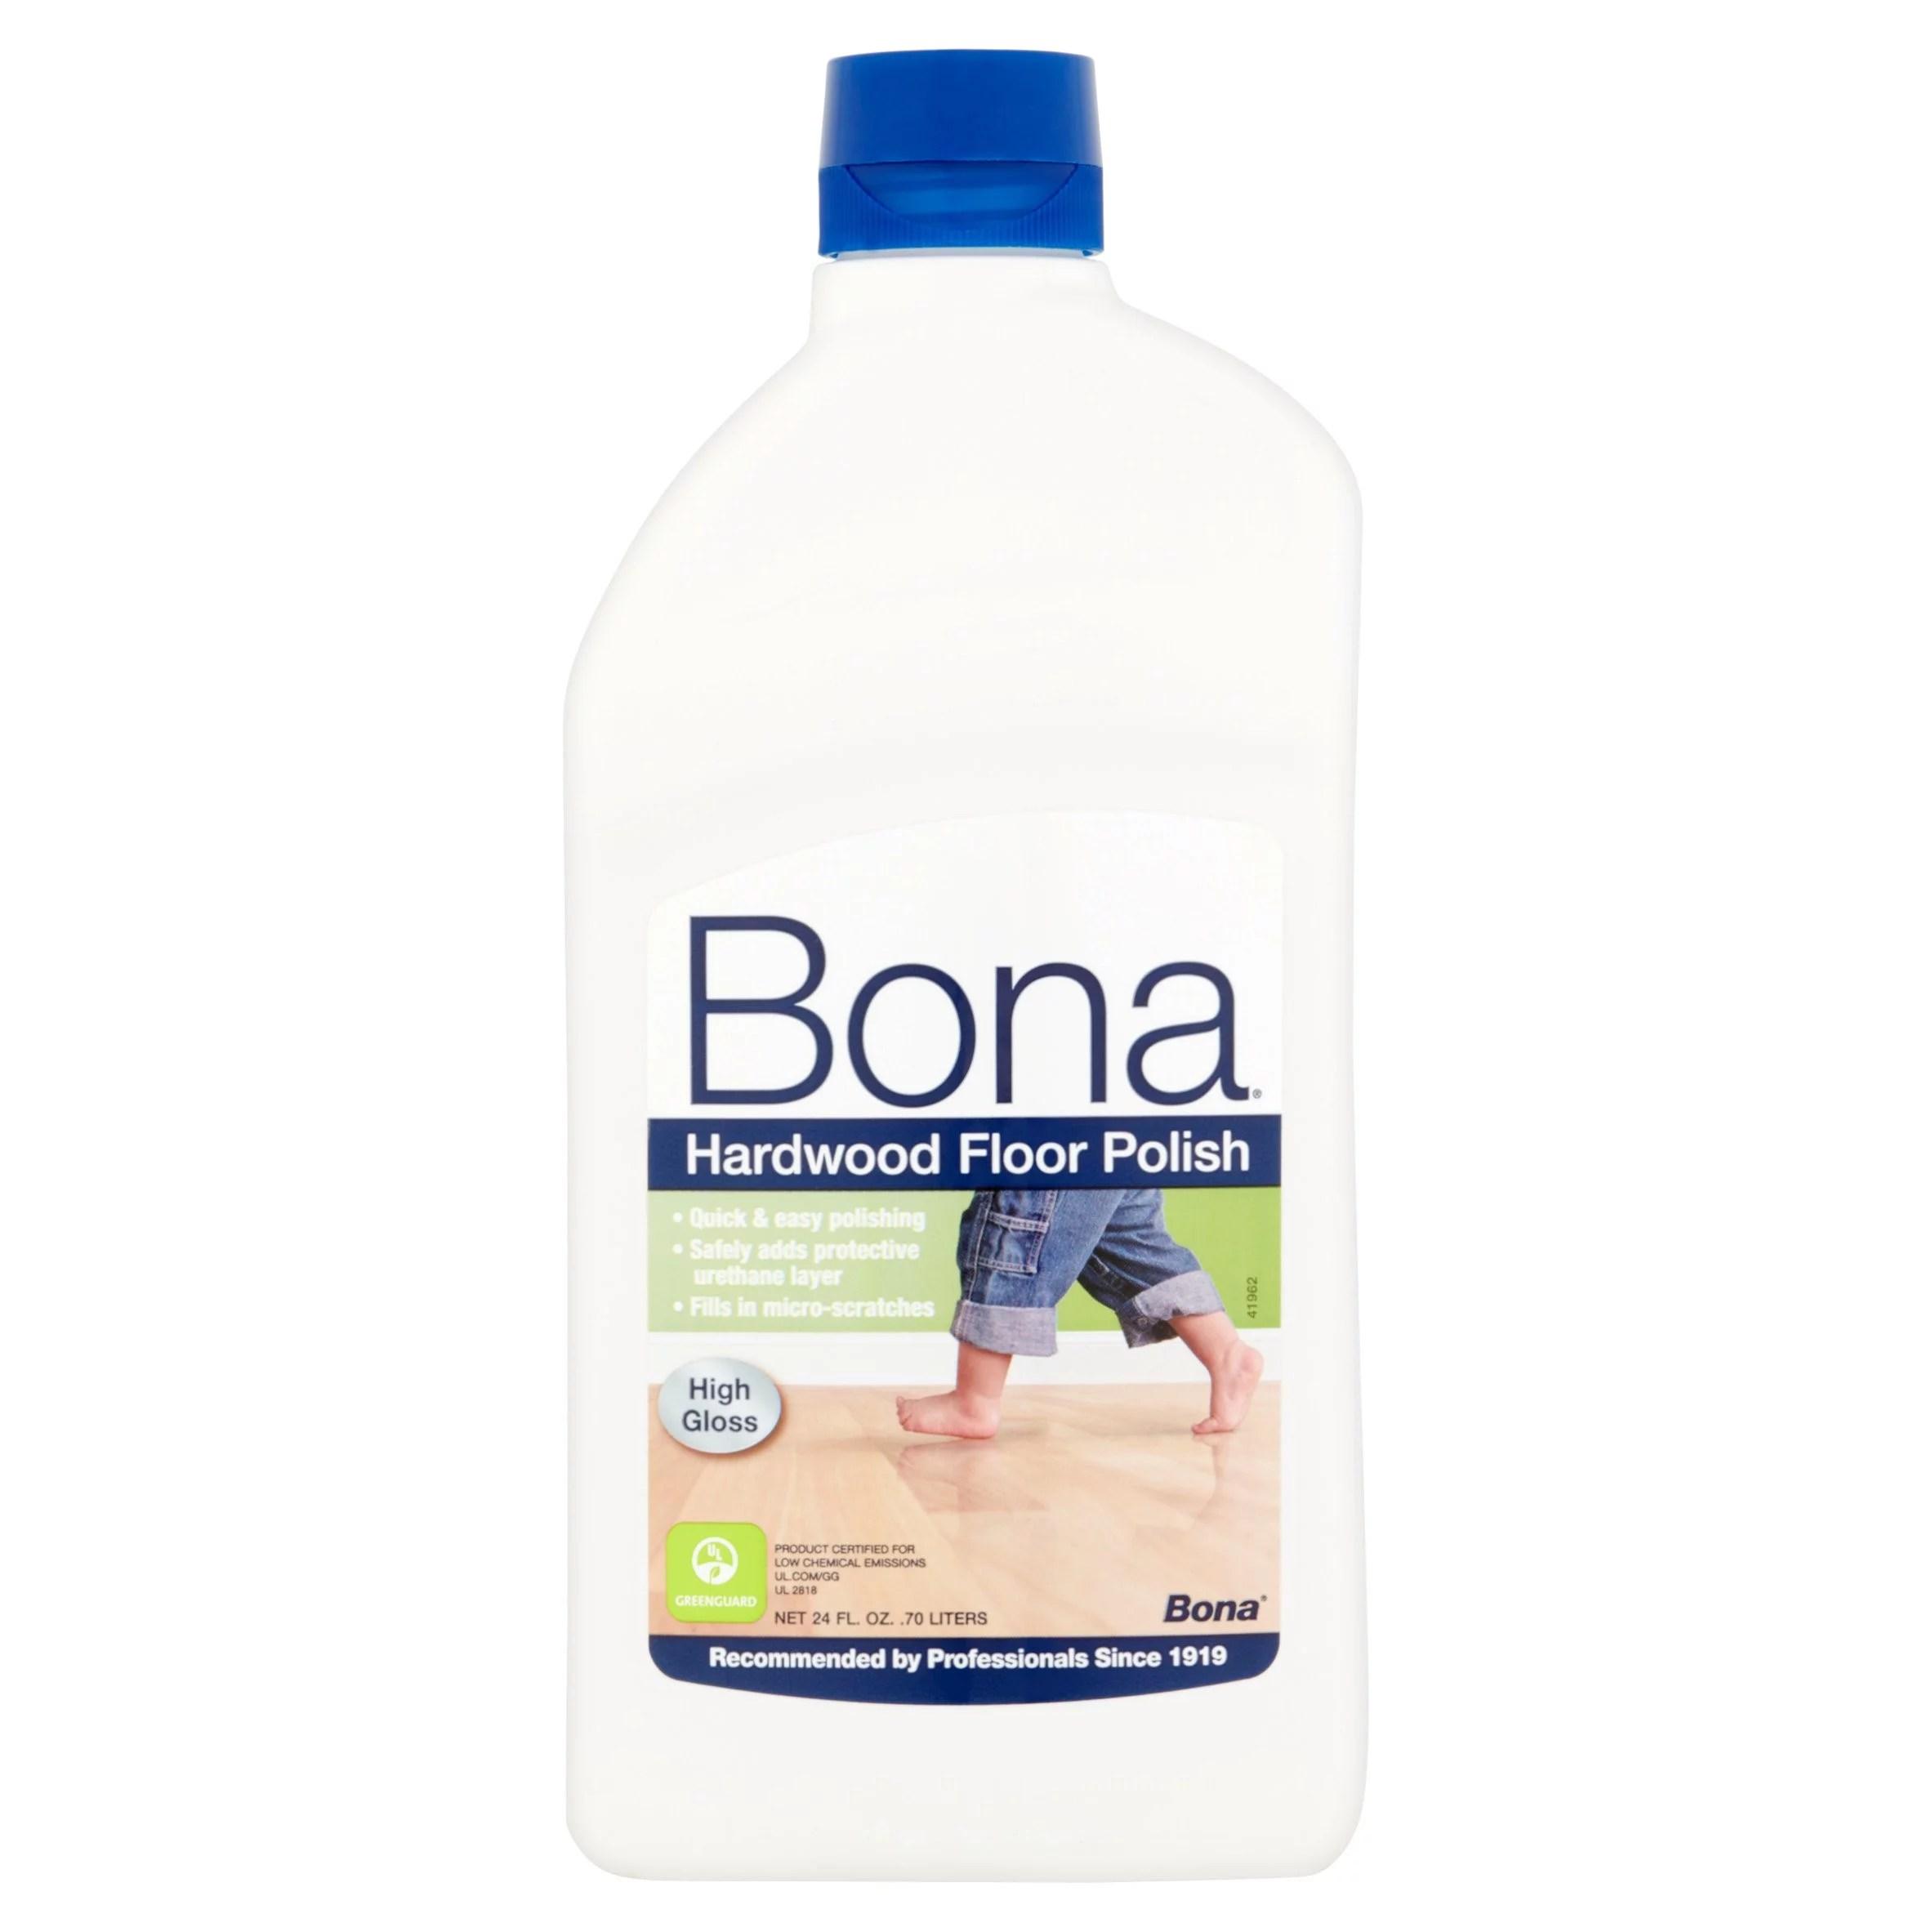 Bona Hardwood Floor Polish 24oz  High Gloss  Walmartcom